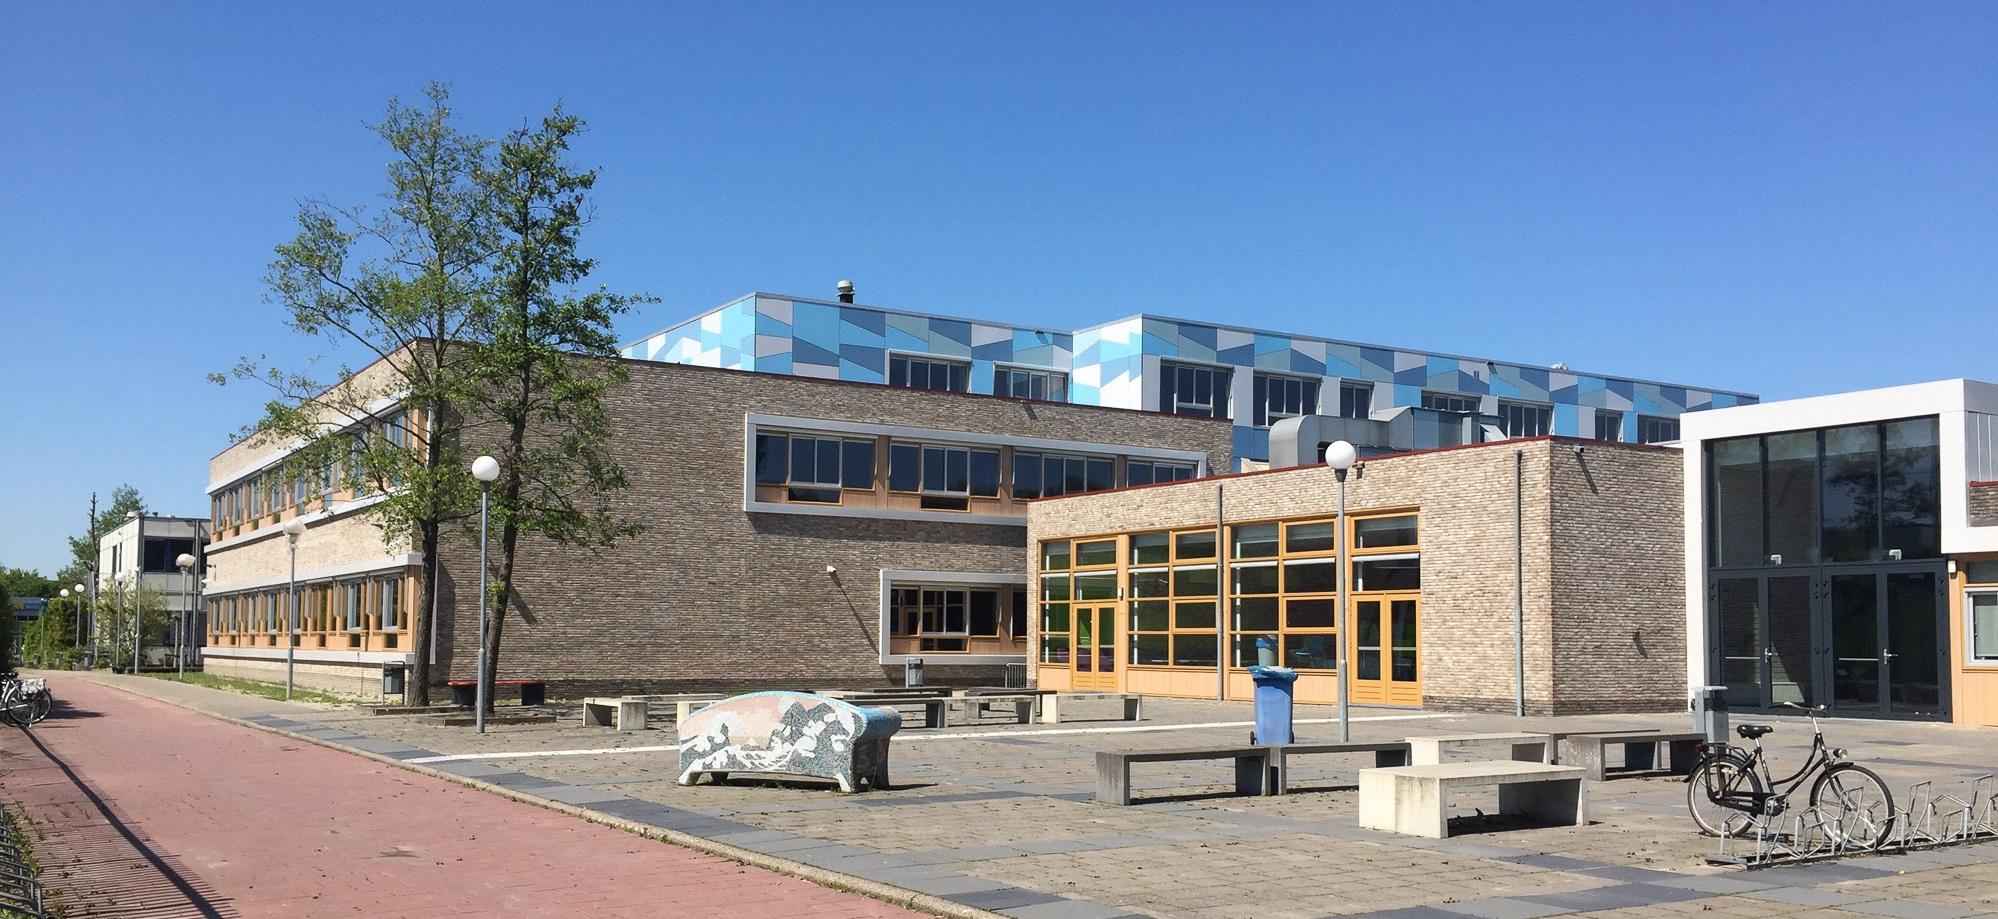 Nieuwe gevels Alfrink College